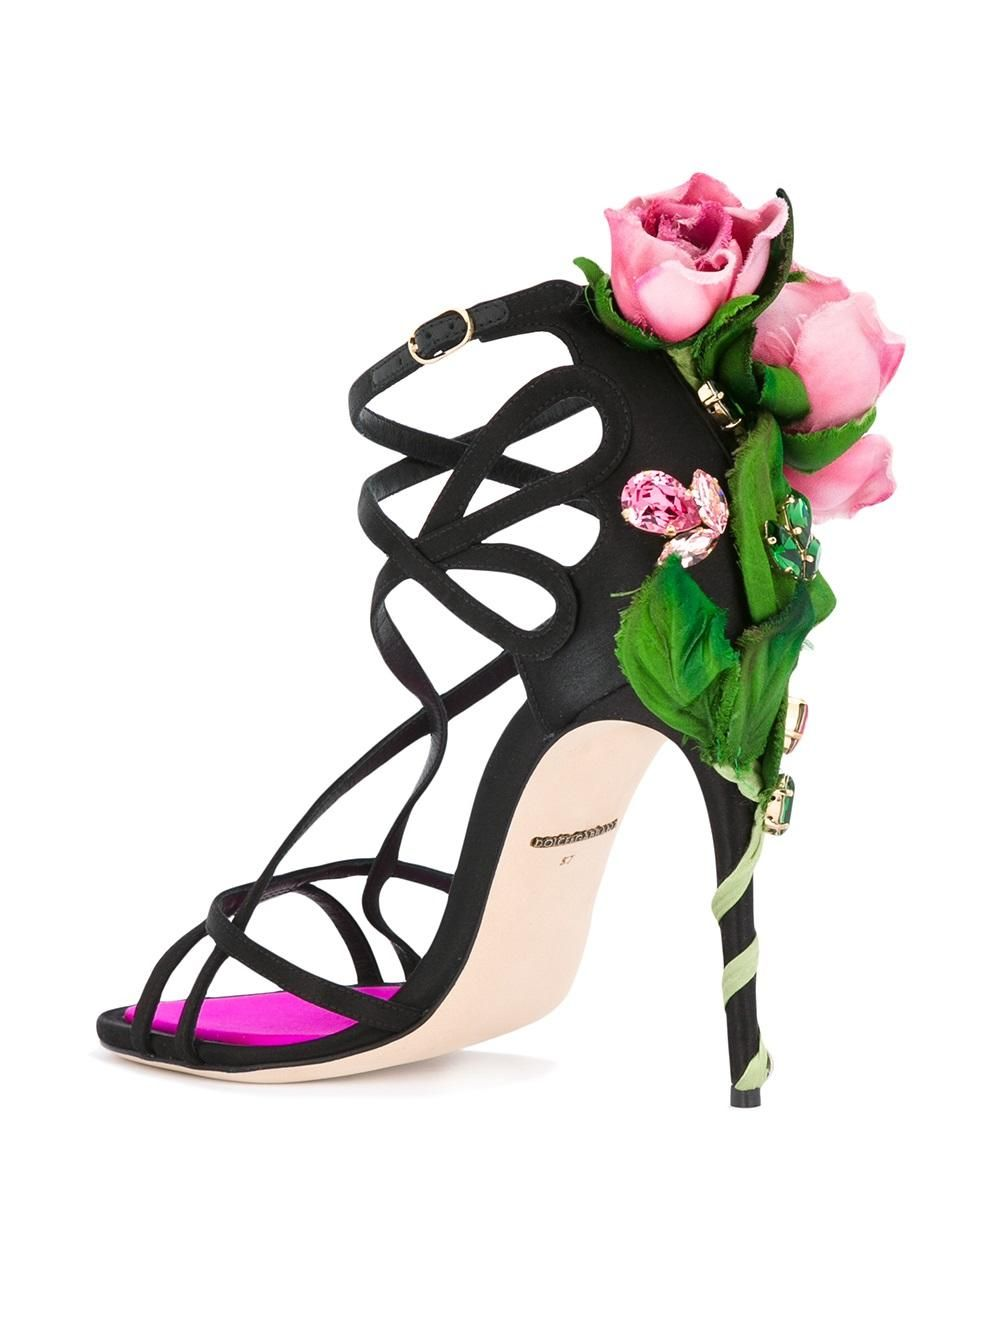 f9634cdb8a997 Dolce   Gabbana Keira Sandals in 2019